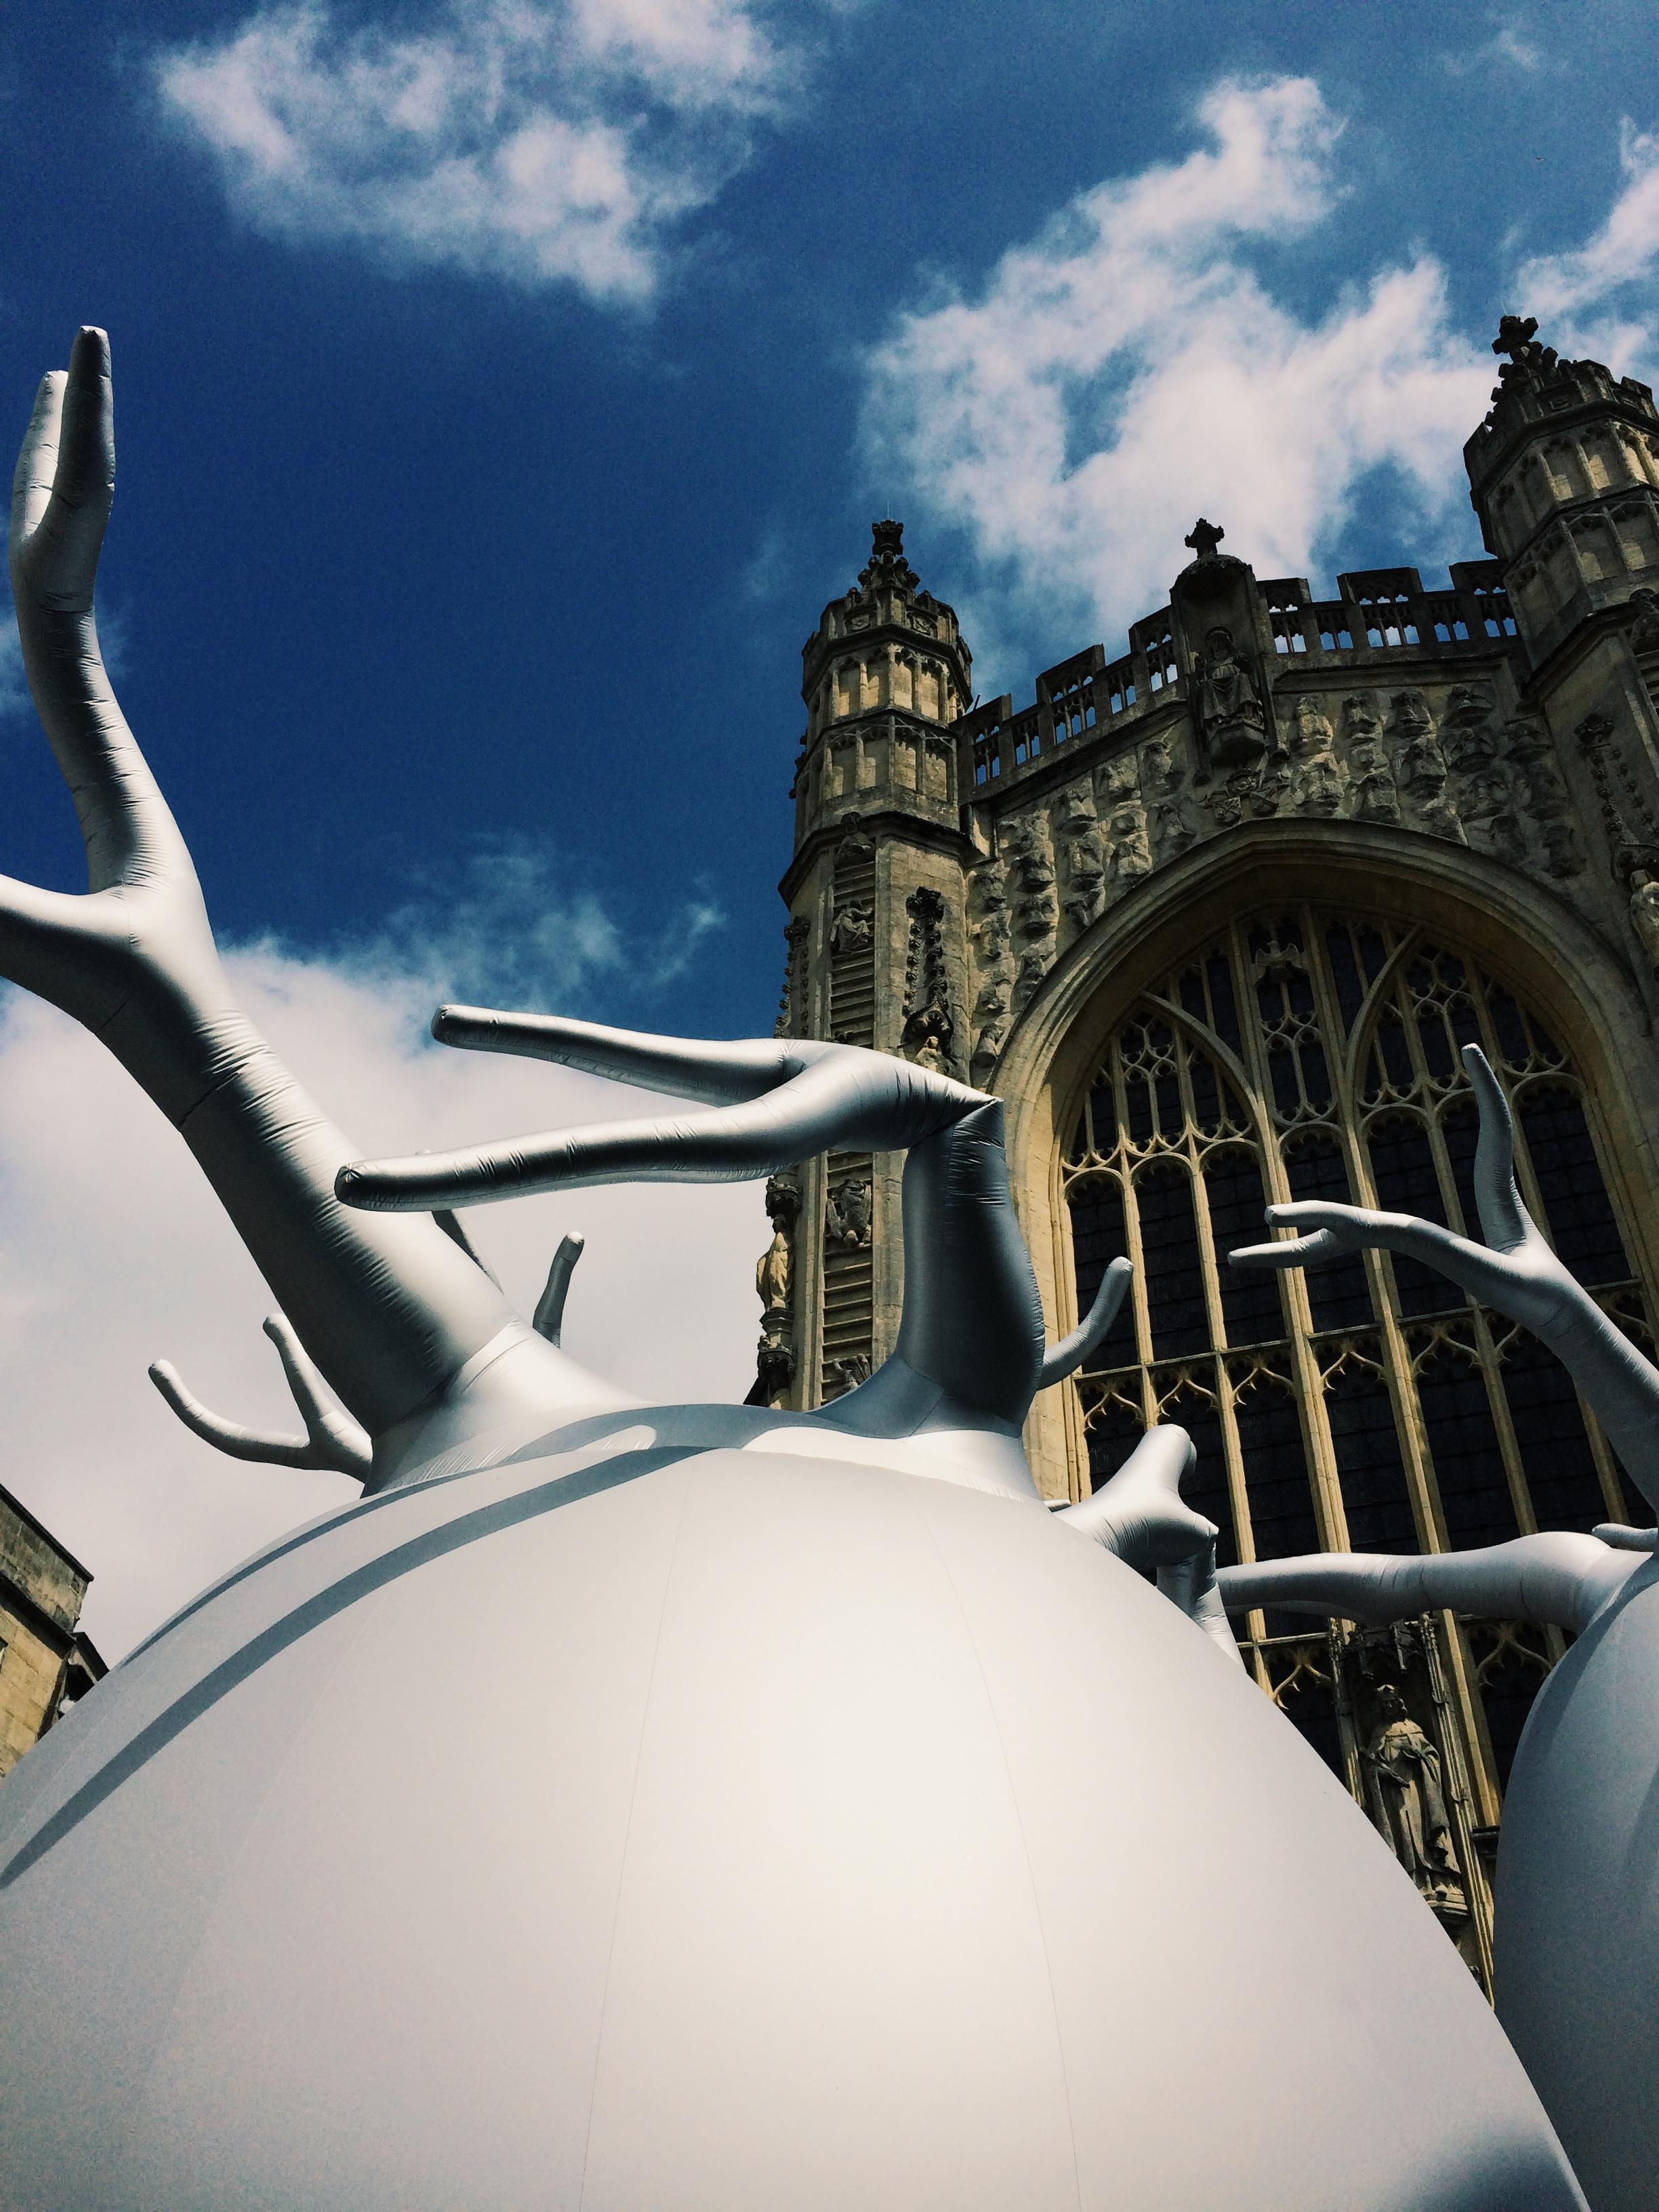 Bath Abbey viewed through art installation